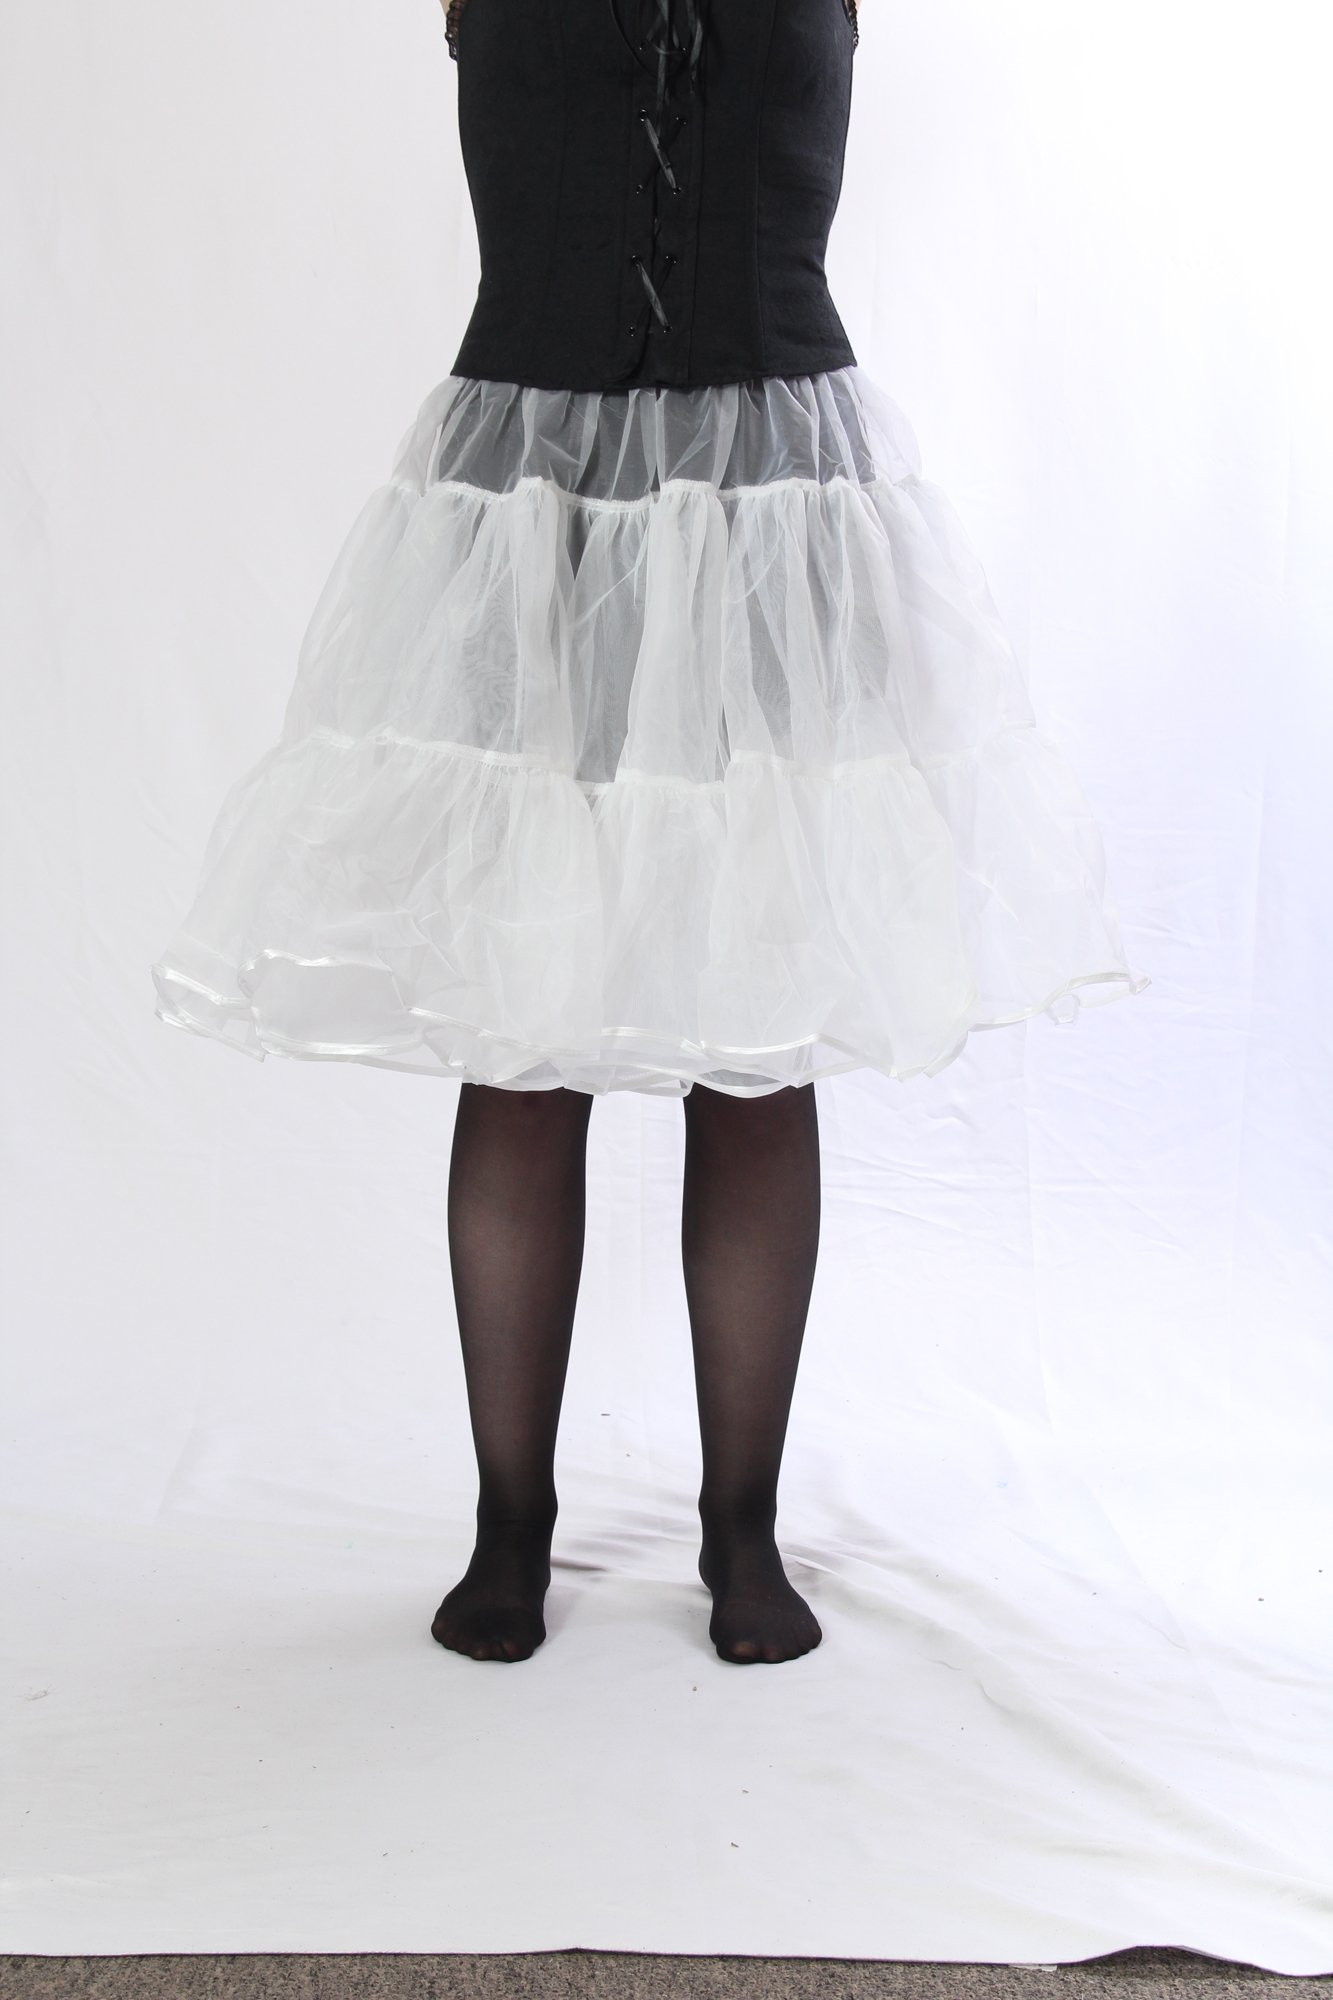 Petticoat Crinoline. Perfect Petticoat Skirt for Vintage Dresses, Petticoat Dresses, Poodle Skirts as Rockabilly Adult Tutu Skirt. Tulle Fabric; 22' Length - White Petticoat by BellaSous (Image #6)